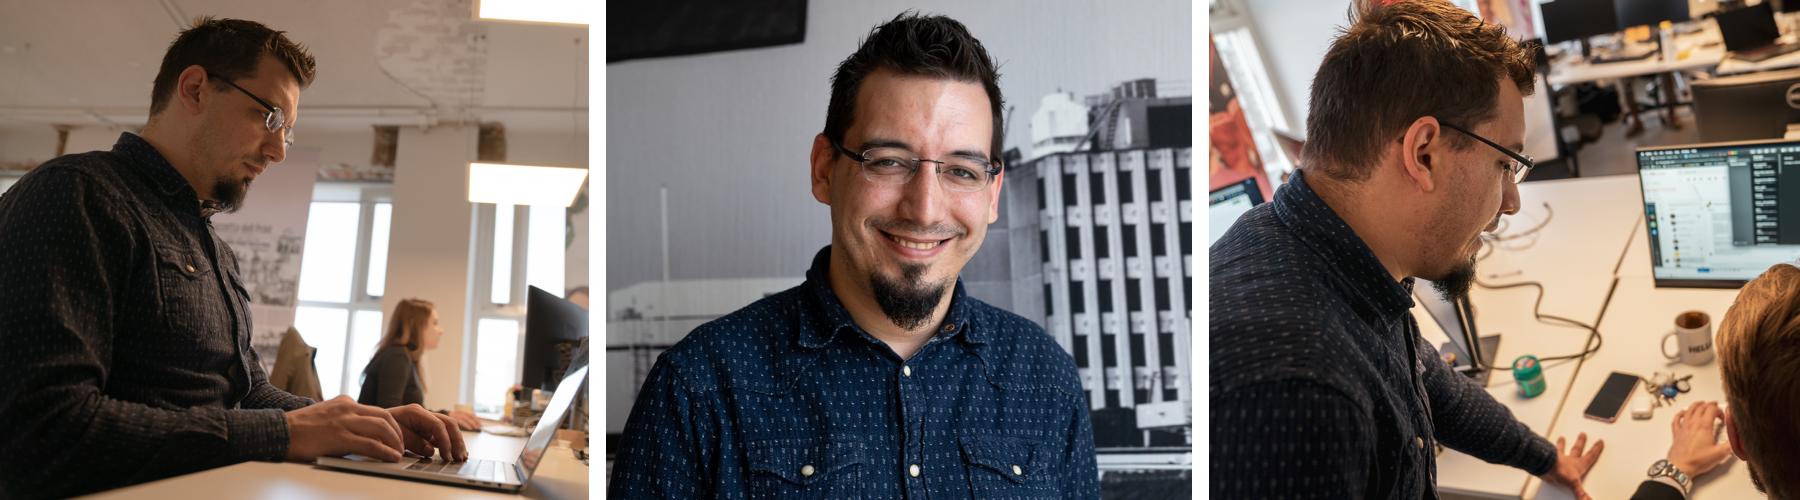 HelloExperts – Voici Dragan, Chef de produit informatique chez Helloprint